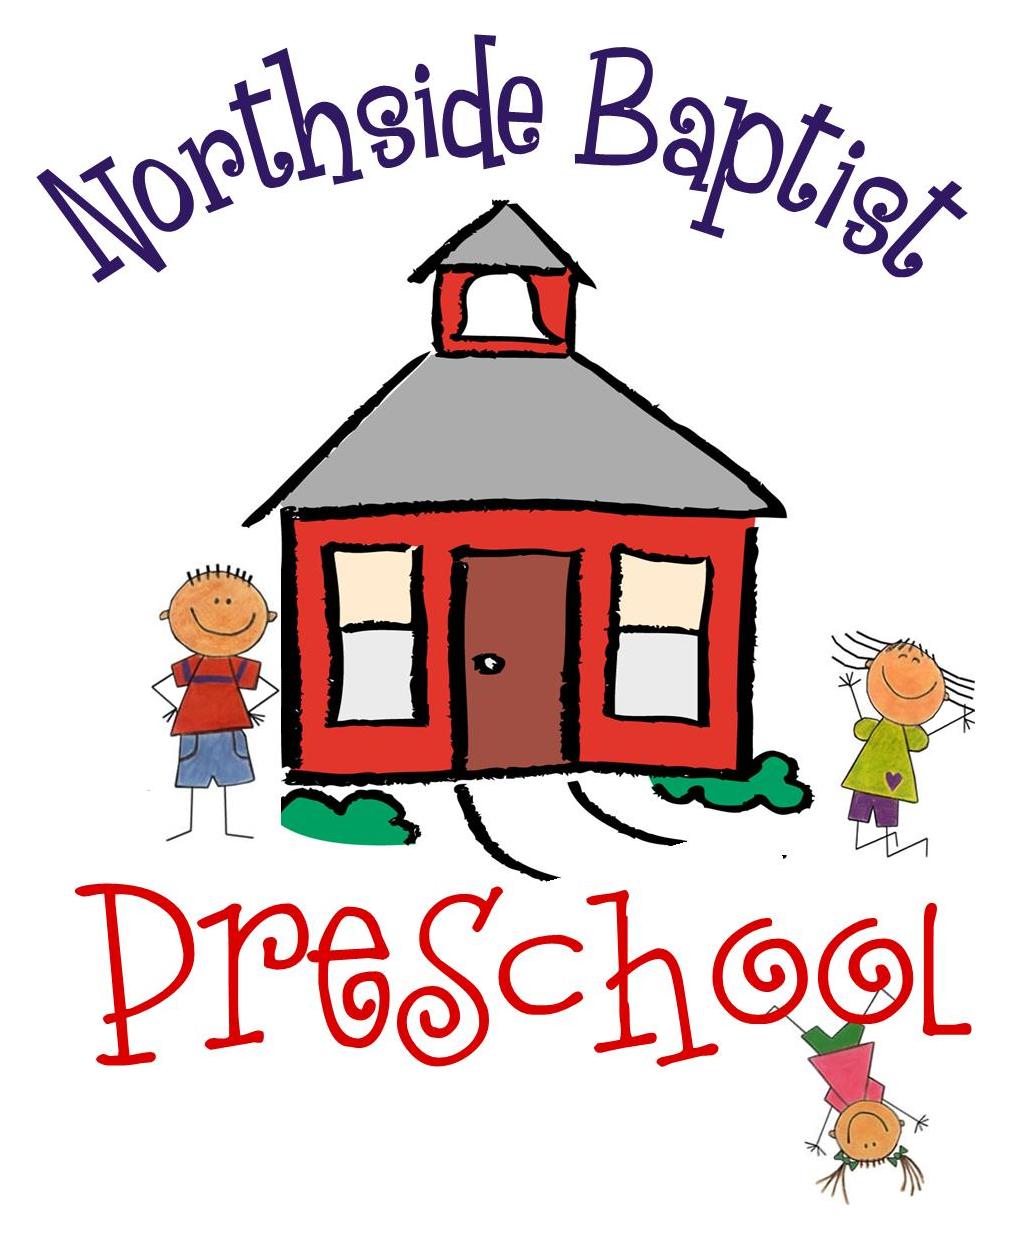 Clipart calendar weekday. Preschool northside baptist church